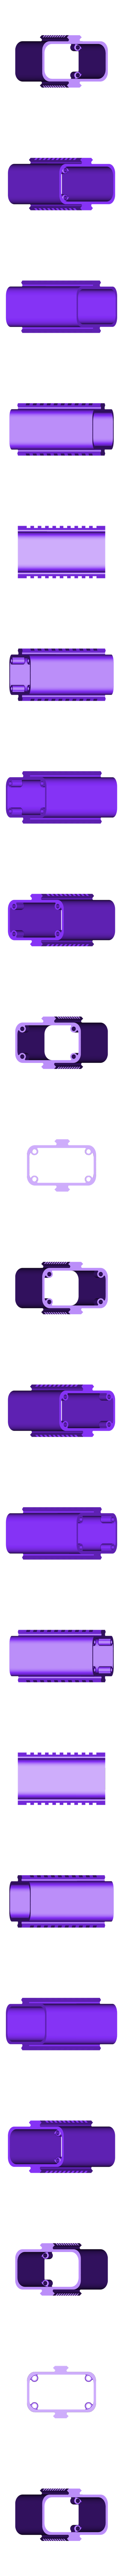 P90_TEST_UPPER.stl Download free STL file M1-MWS (Modular Weapon System) • 3D printing model, MuSSy